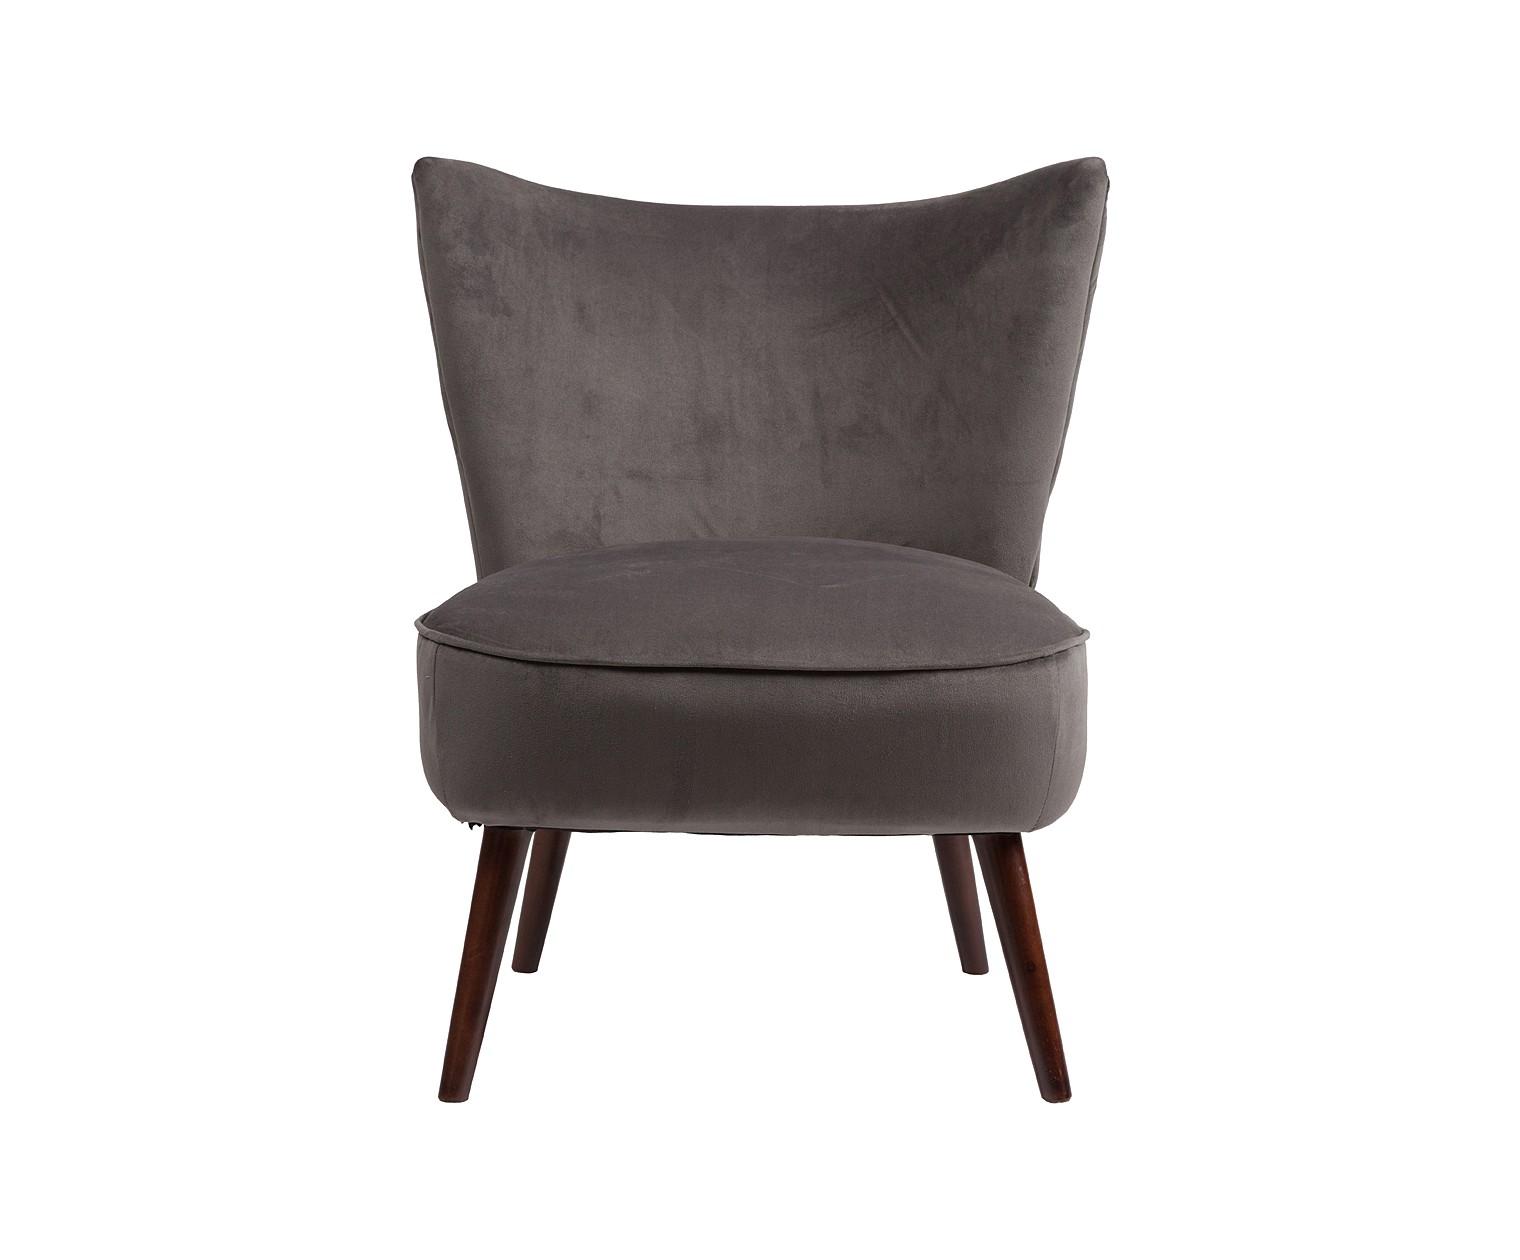 Кресло Vermont ChairПолукресла<br><br><br>Material: Текстиль<br>Width см: 62<br>Depth см: 68<br>Height см: 75,5